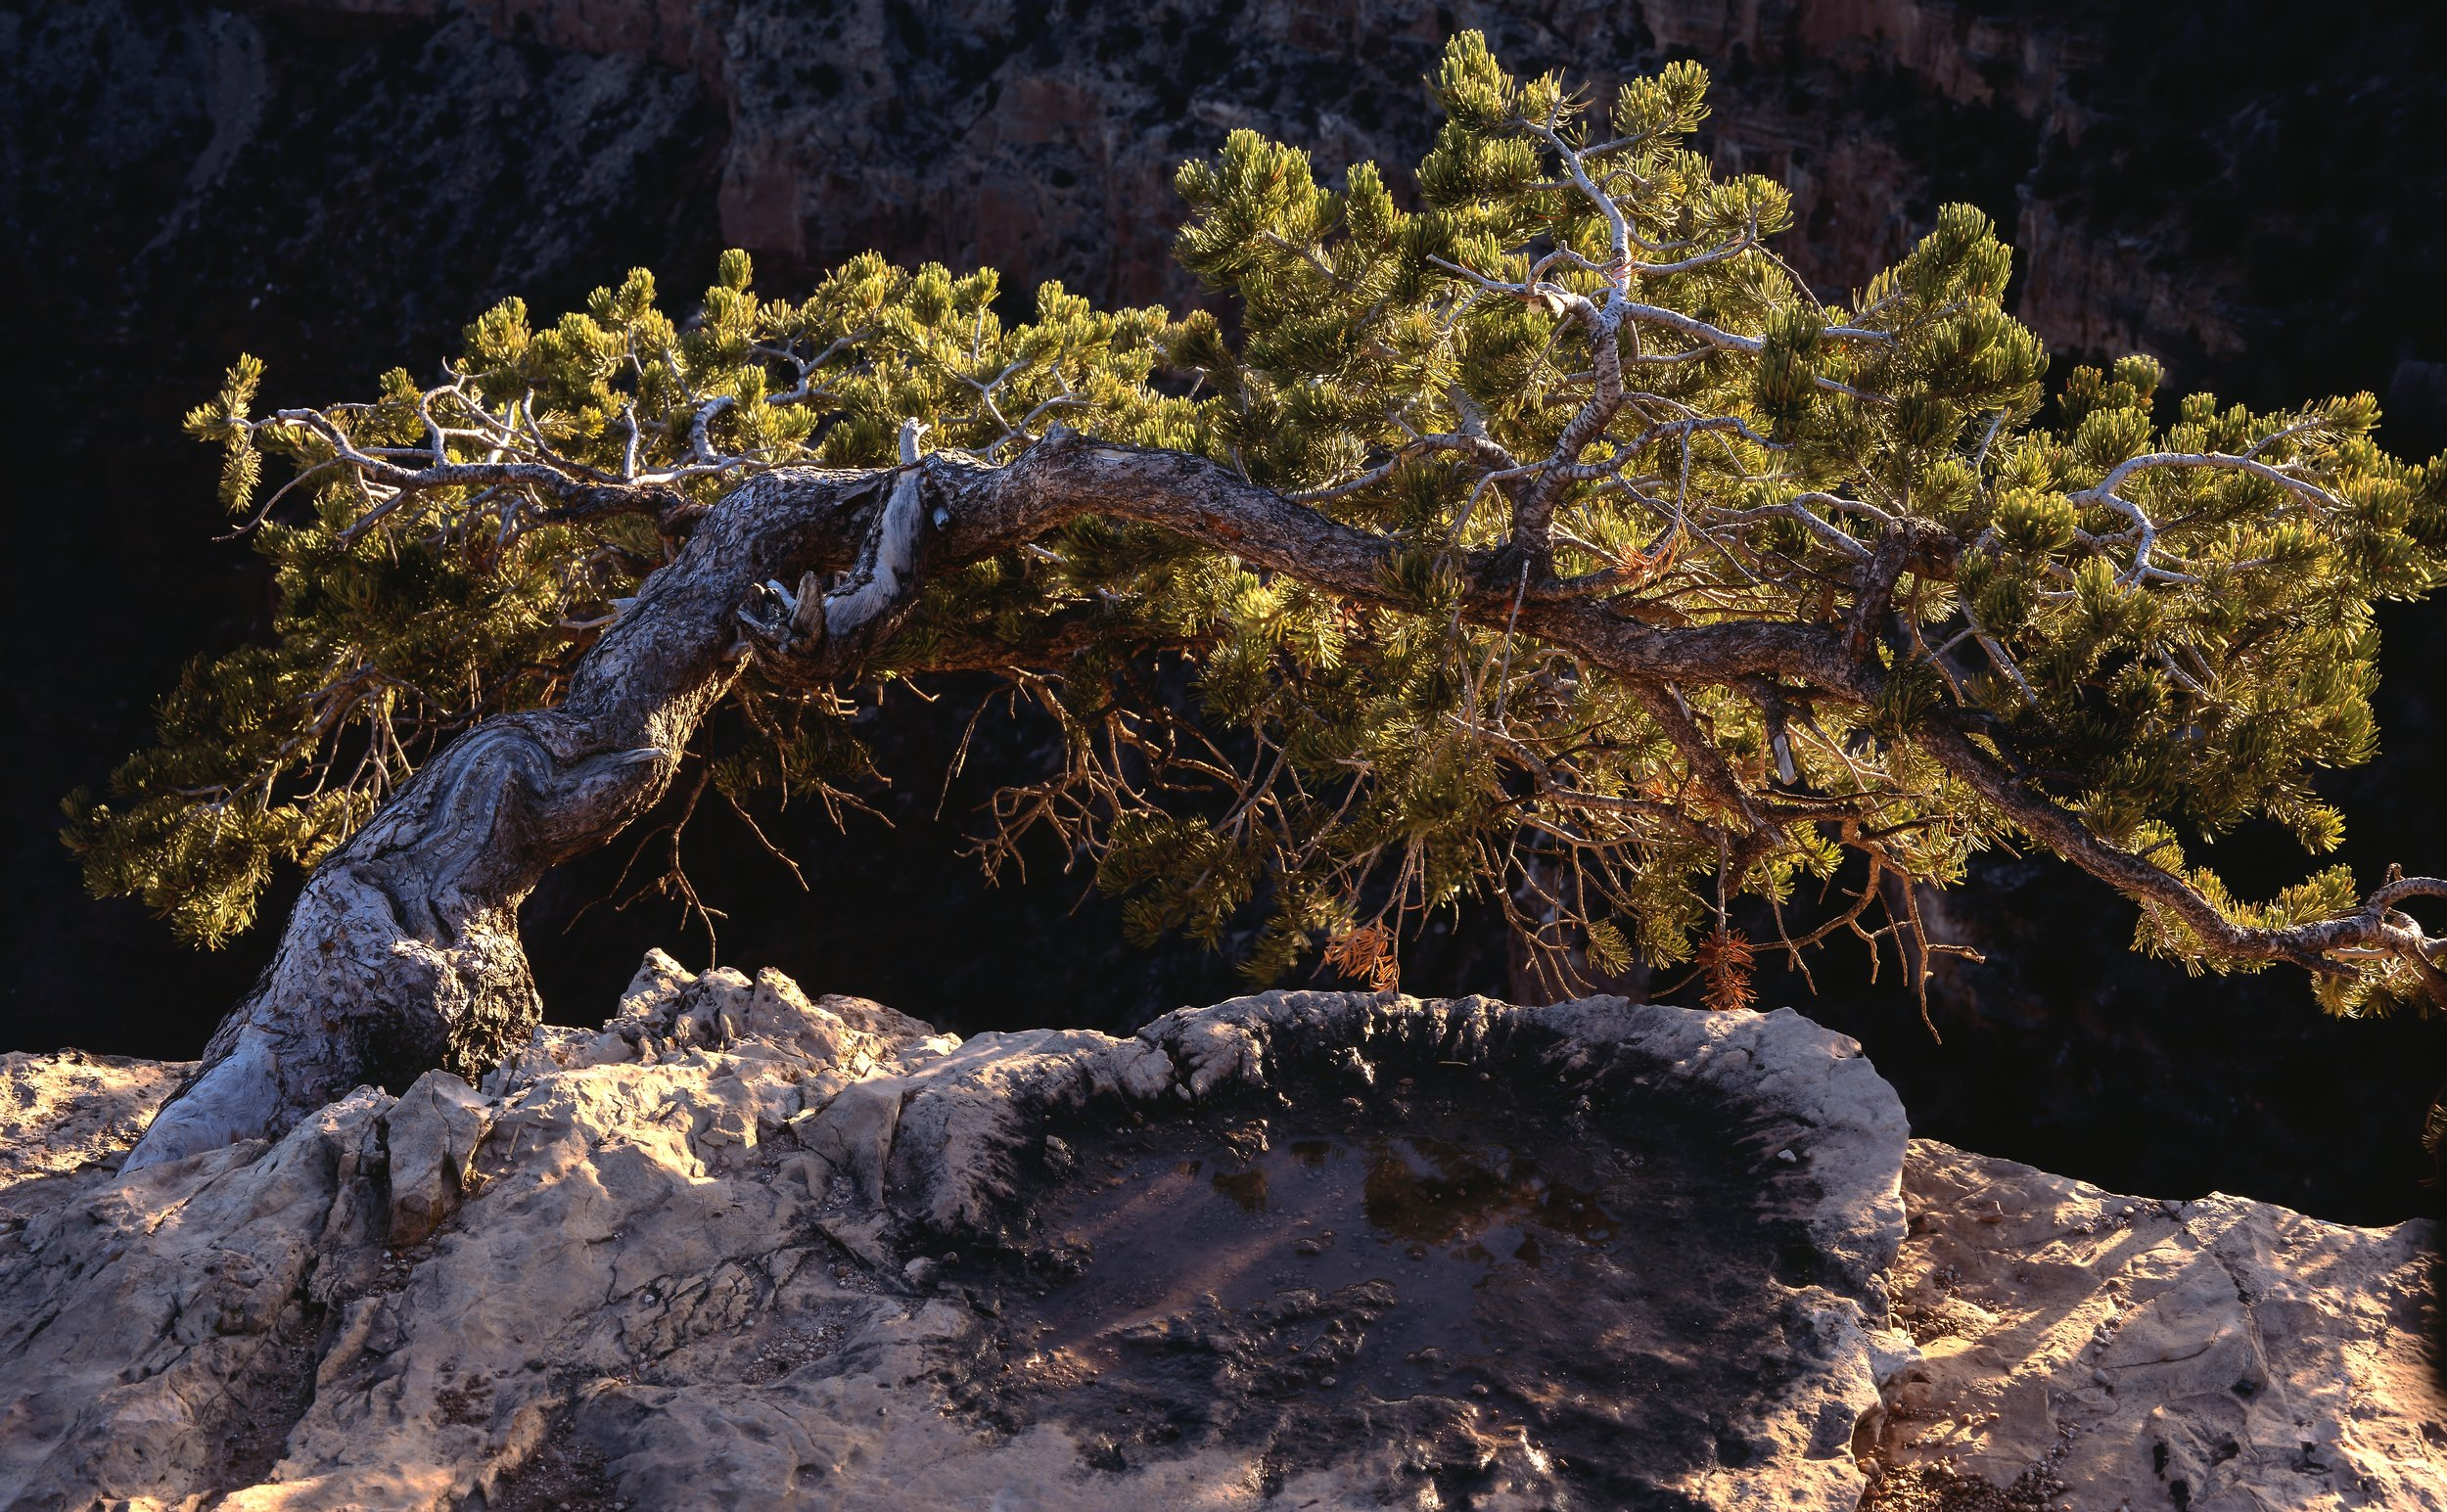 How Trees Talk- Treeline by Patagonia